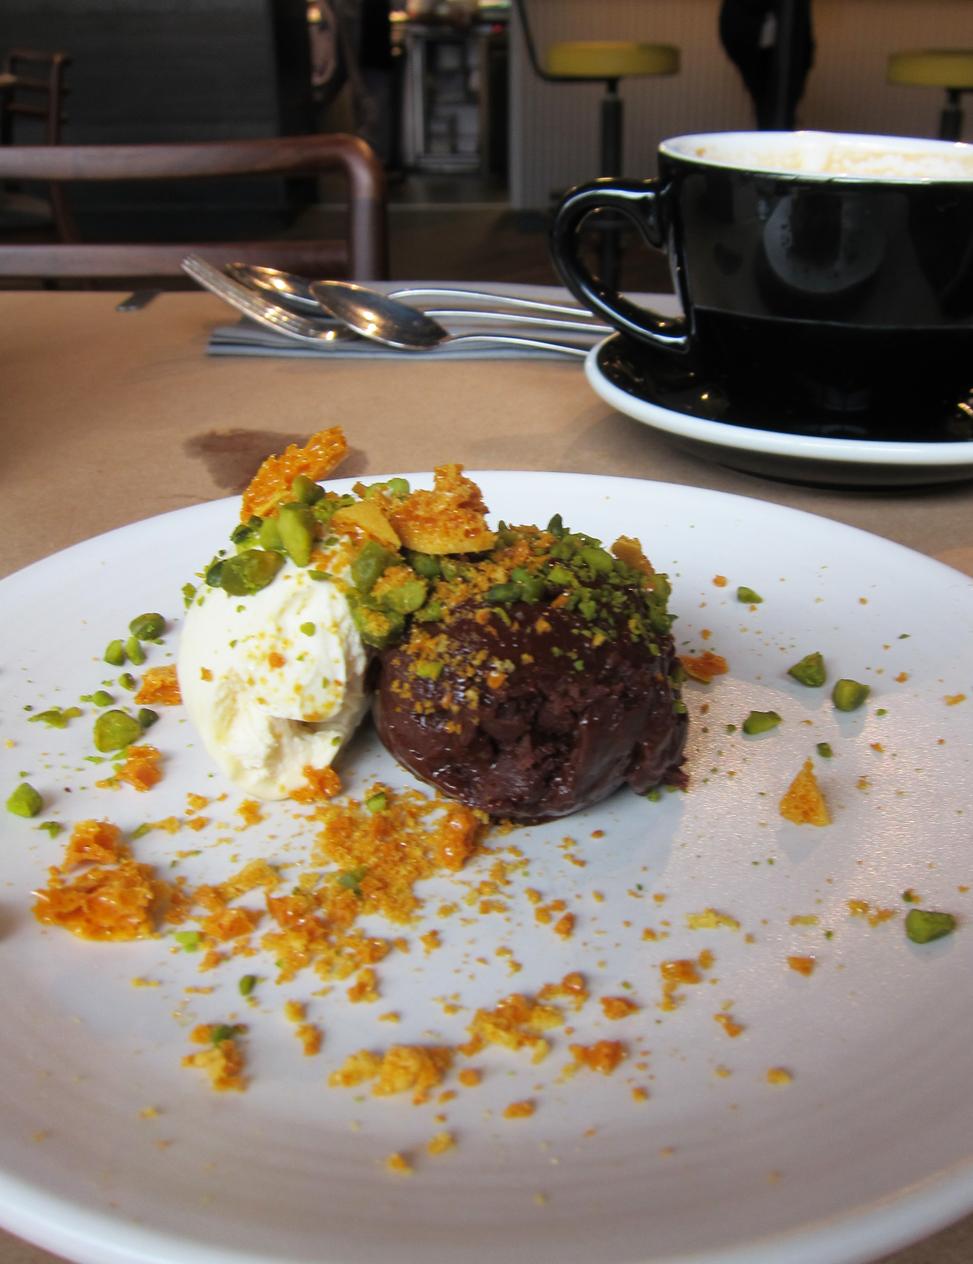 Palatino Chocolate Dessert